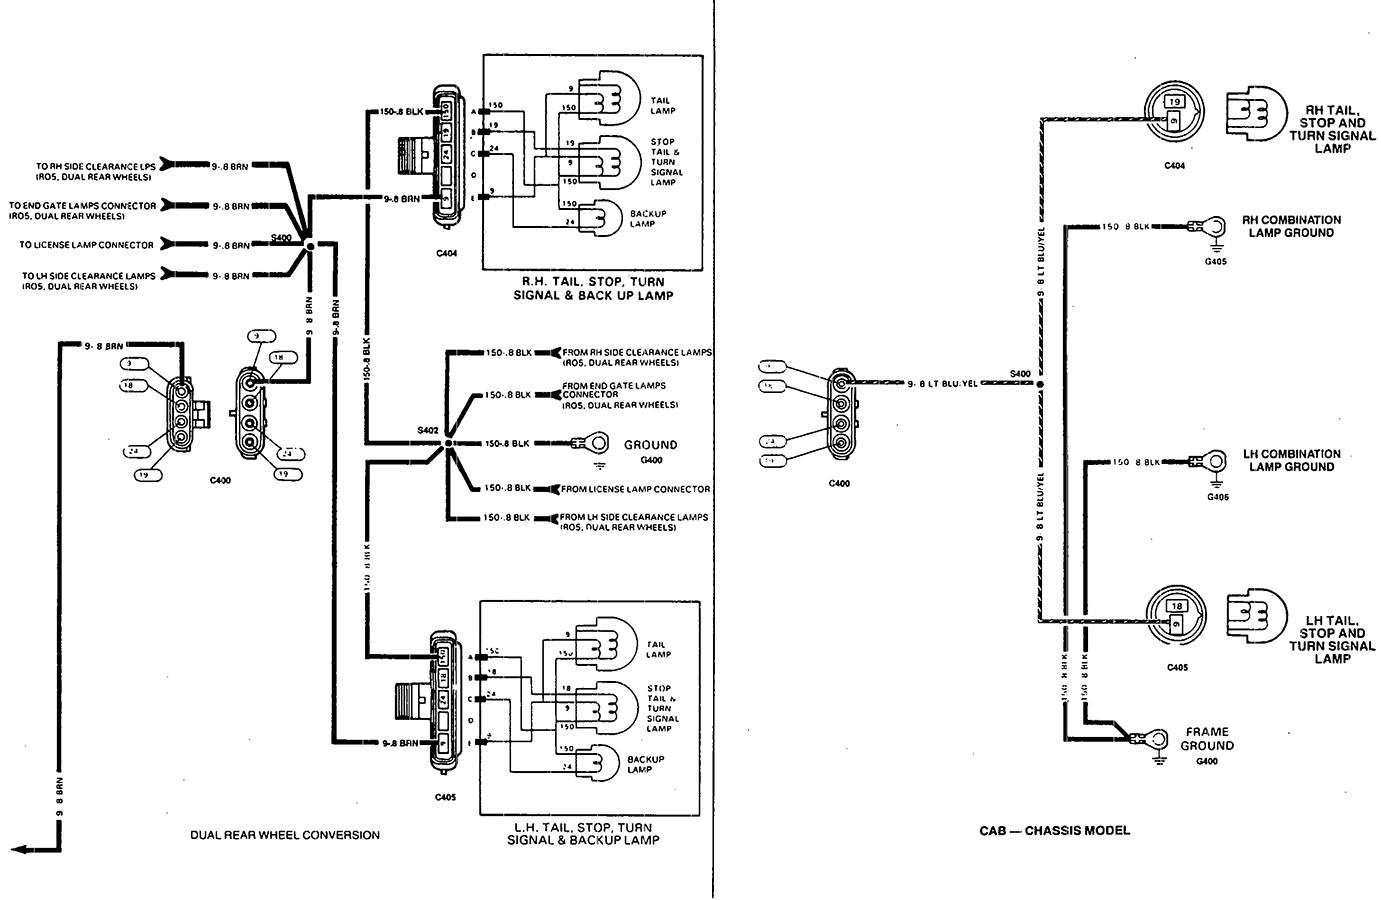 WY_8145] 2006 Chevrolet Silverado Wiring Diagram Wiring DiagramSequ Ologi Bletu Exmet Mohammedshrine Librar Wiring 101